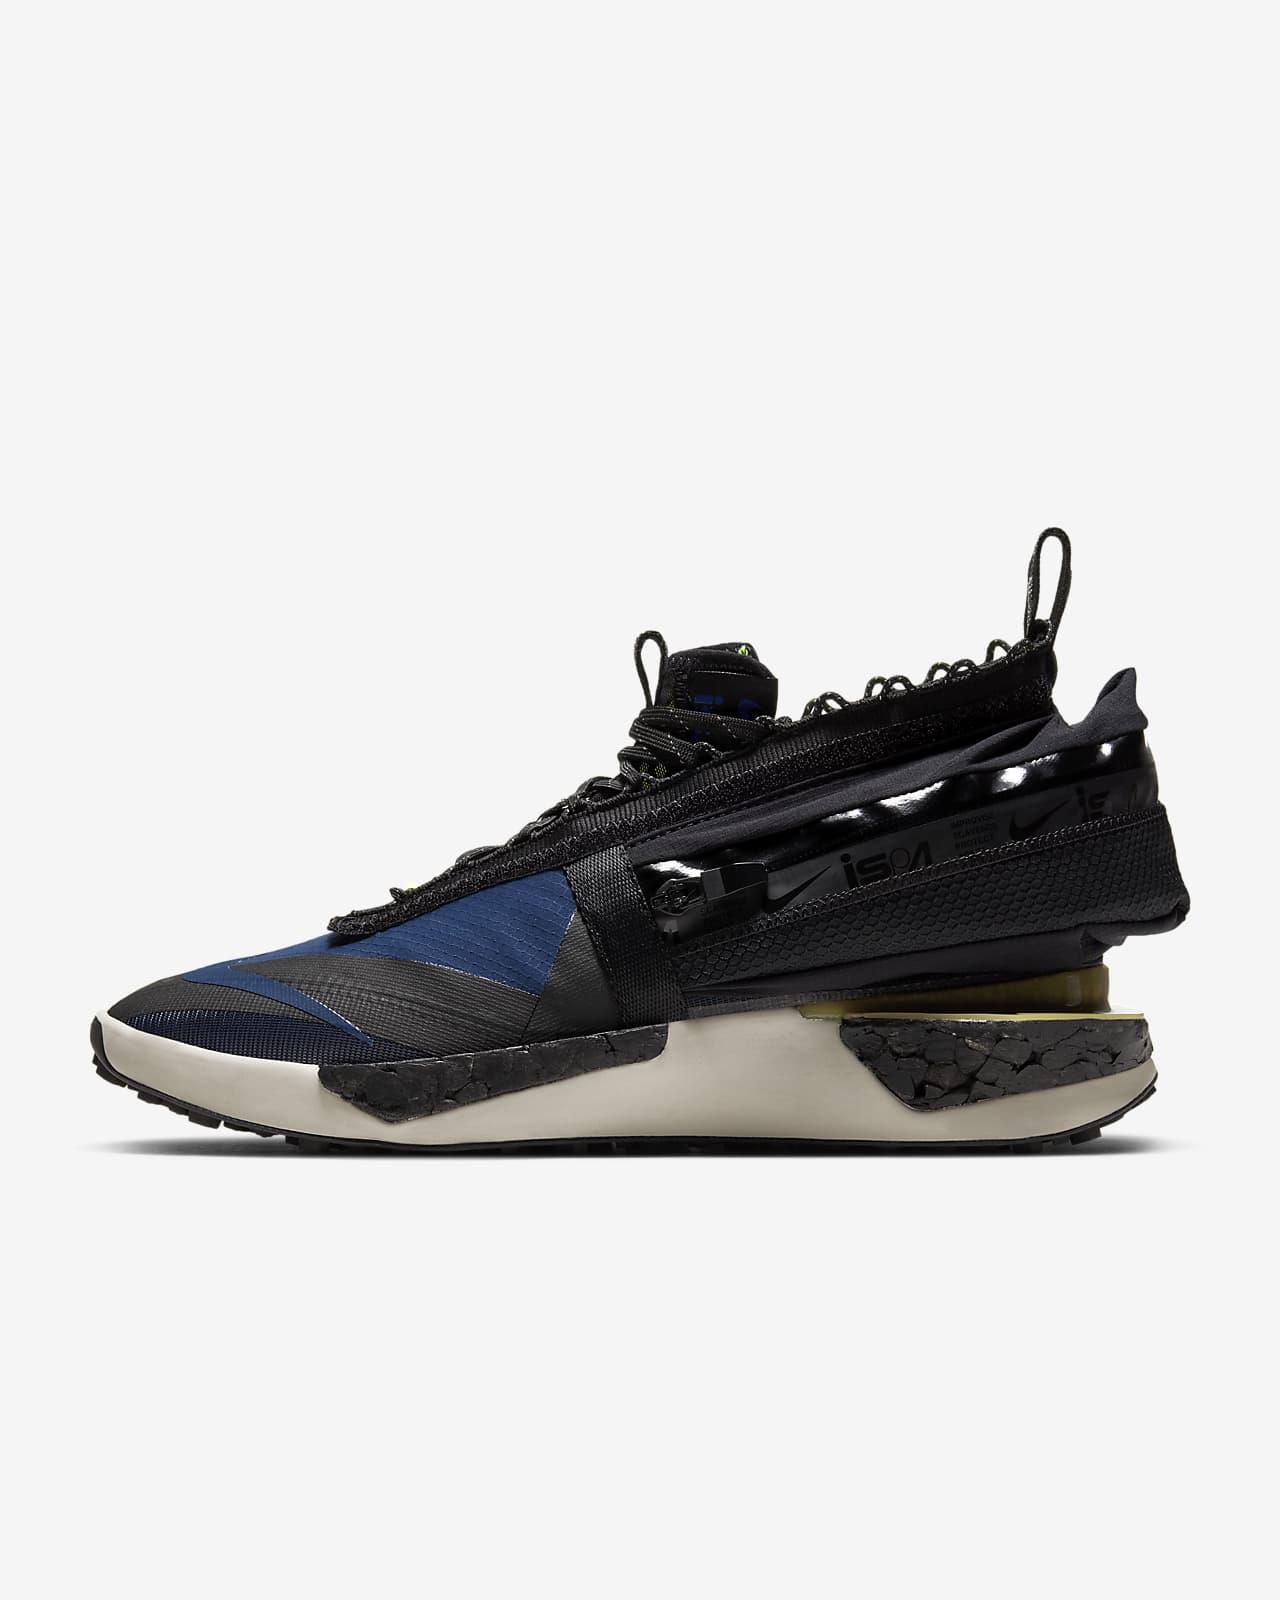 Nike ISPA Drifter Gator Shoe